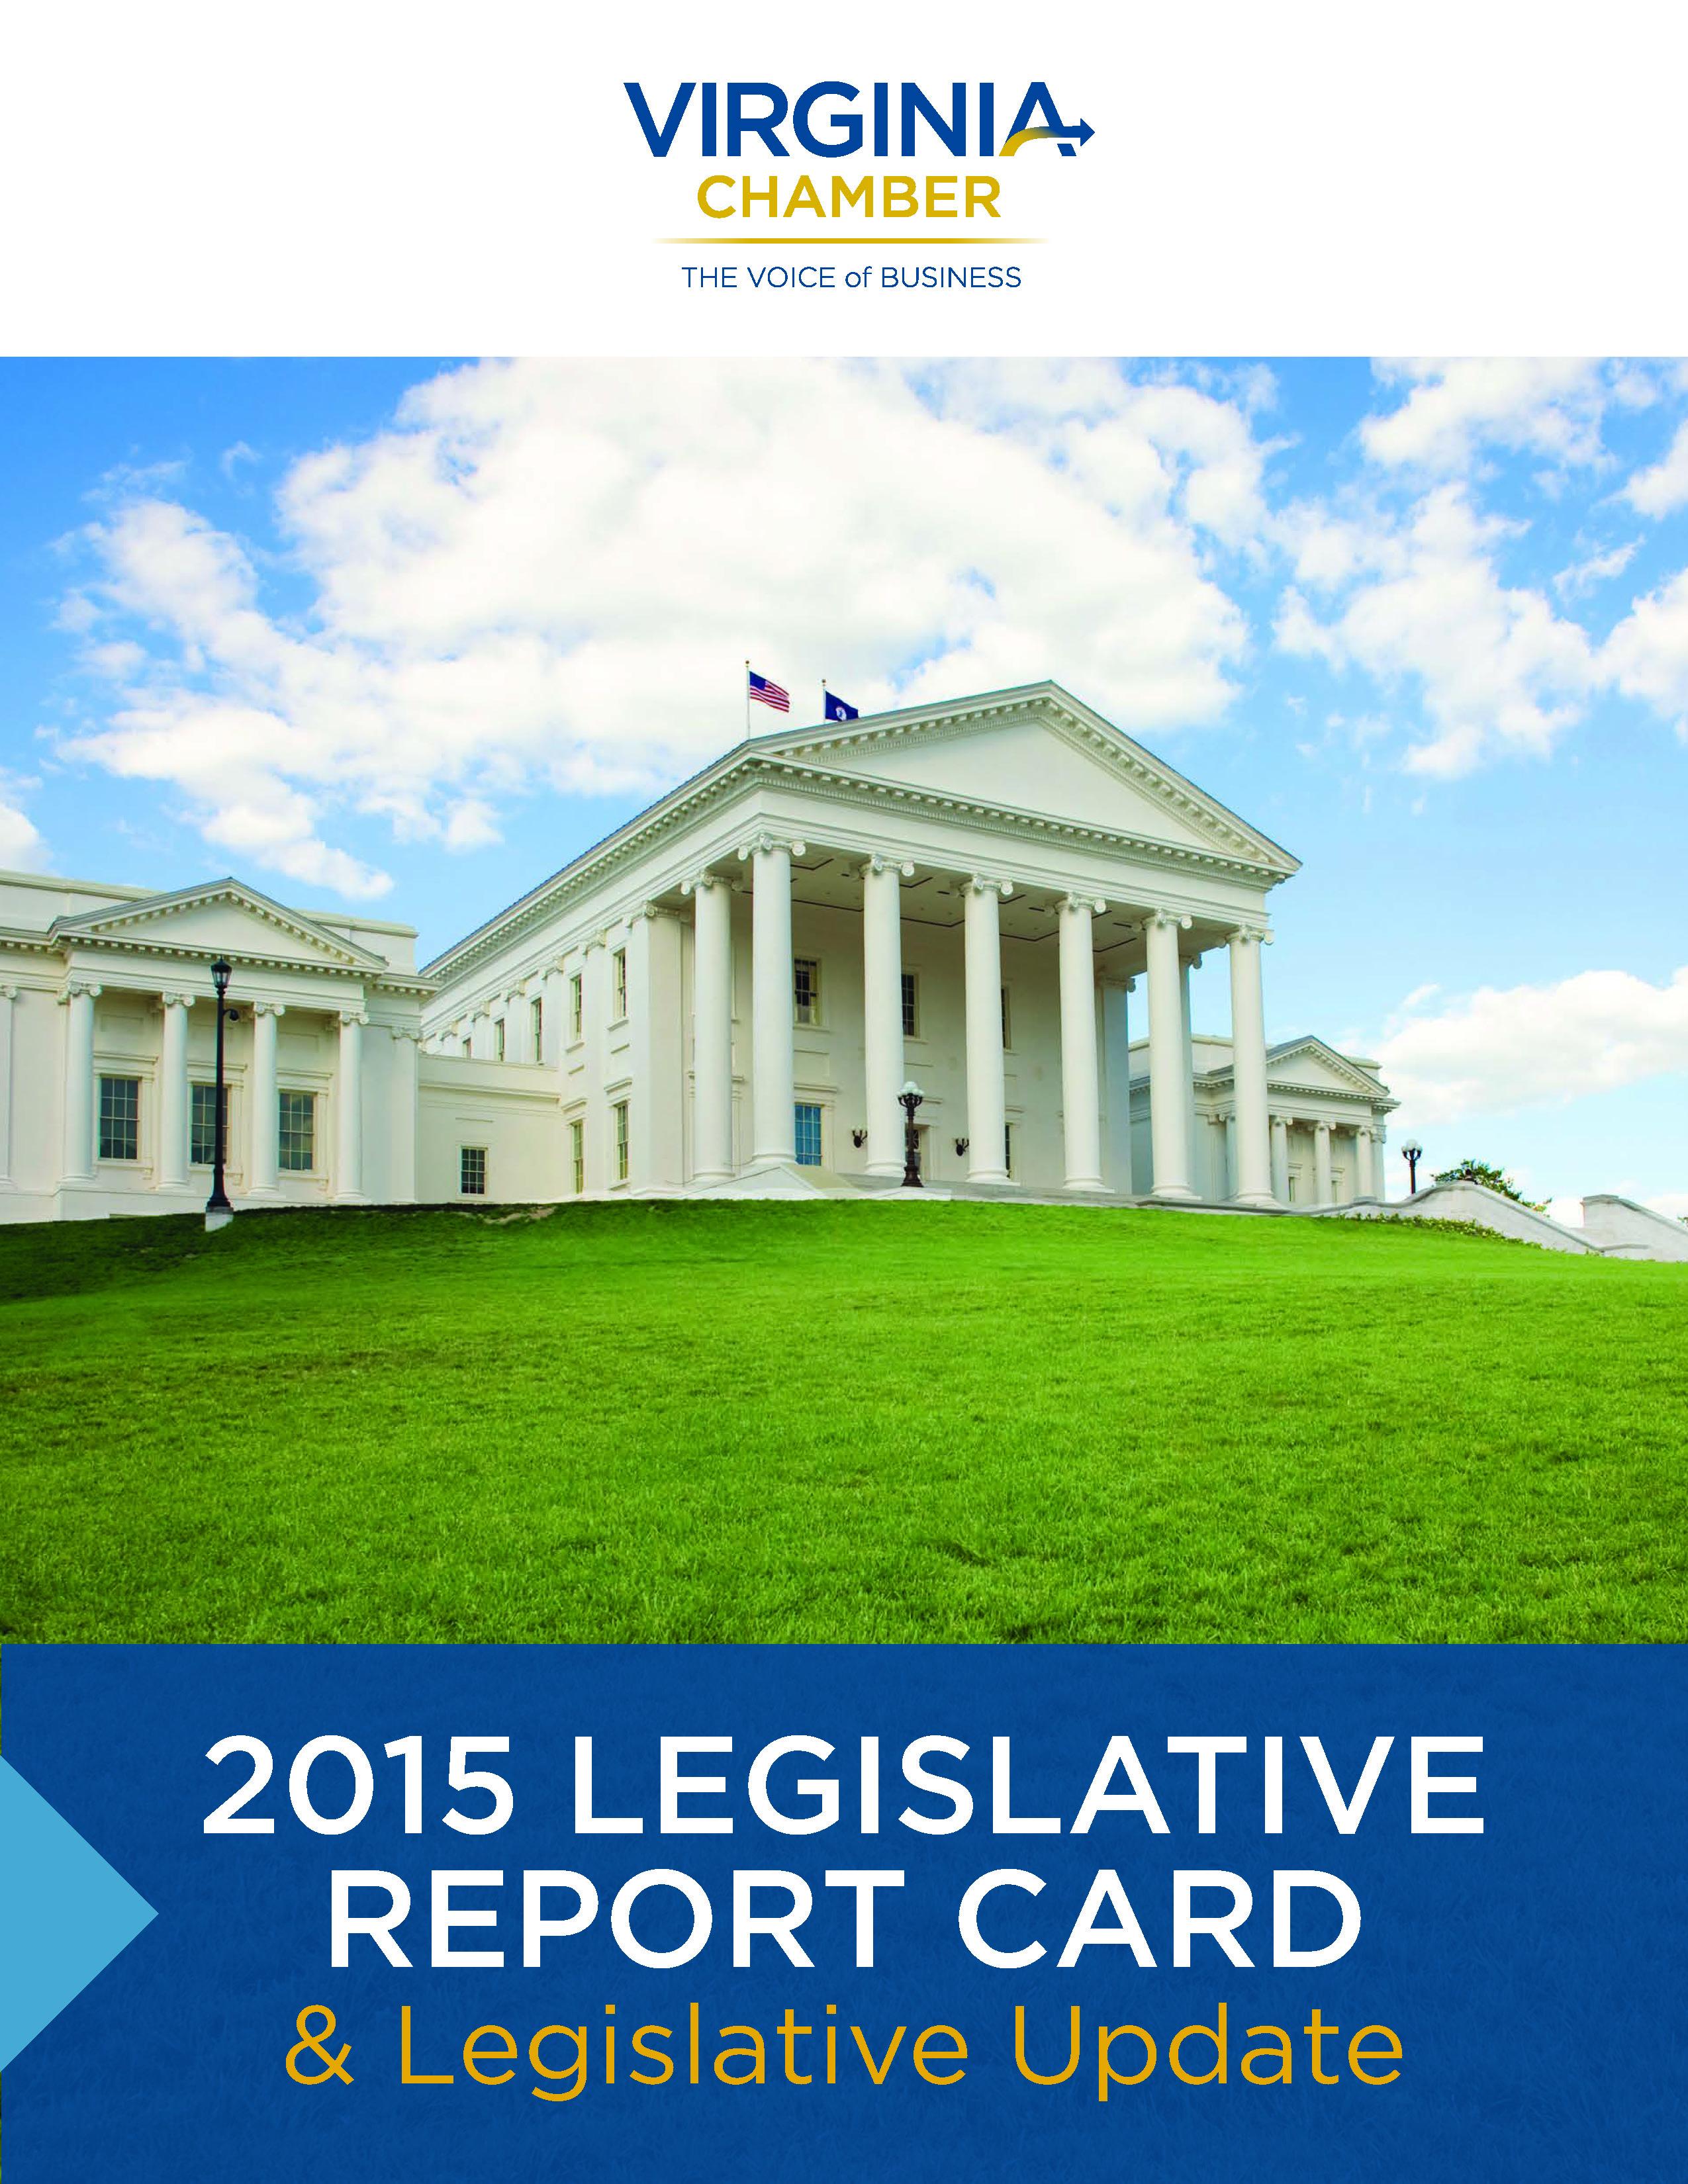 2015 Legislative Report Card